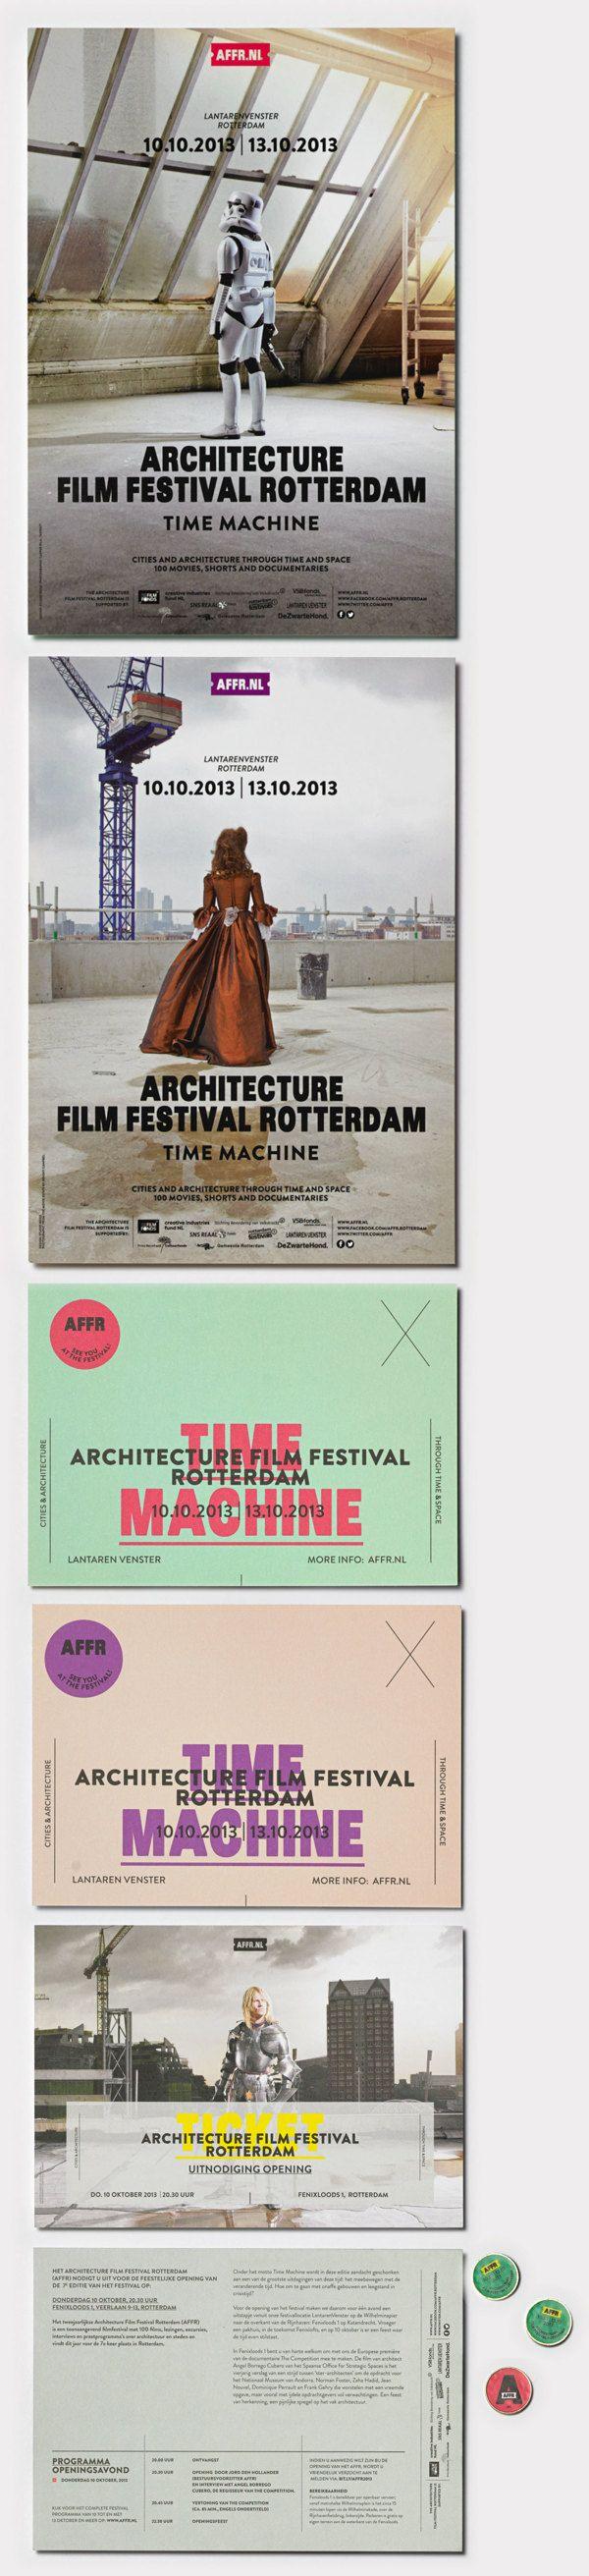 ARCHITECTURE FILM FESTIVAL ROTTERDAM by Studio Beige, via Behance